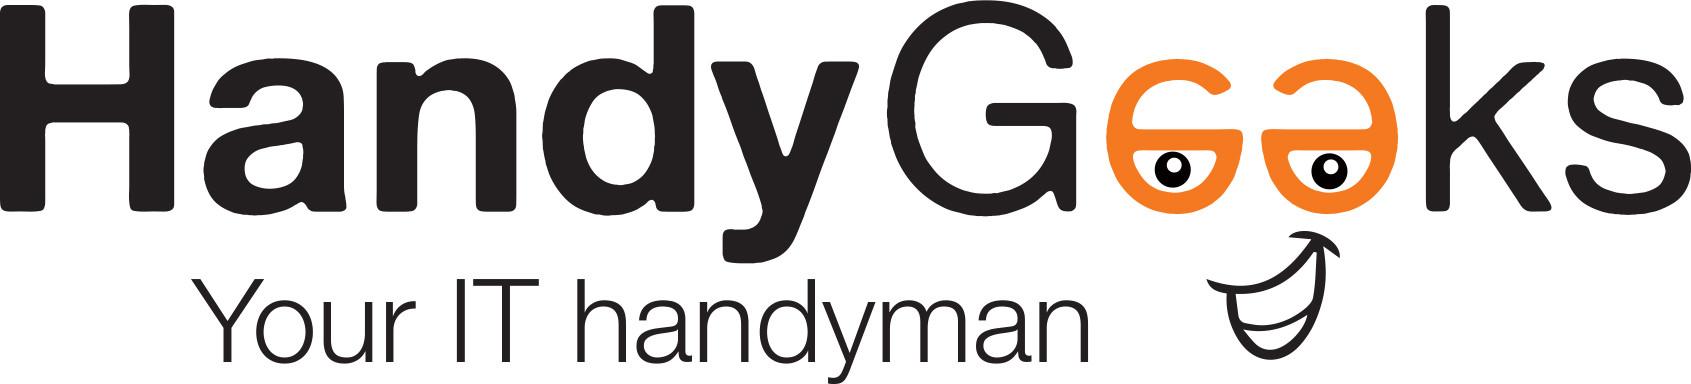 Handy_Geeks_Logo.jpg